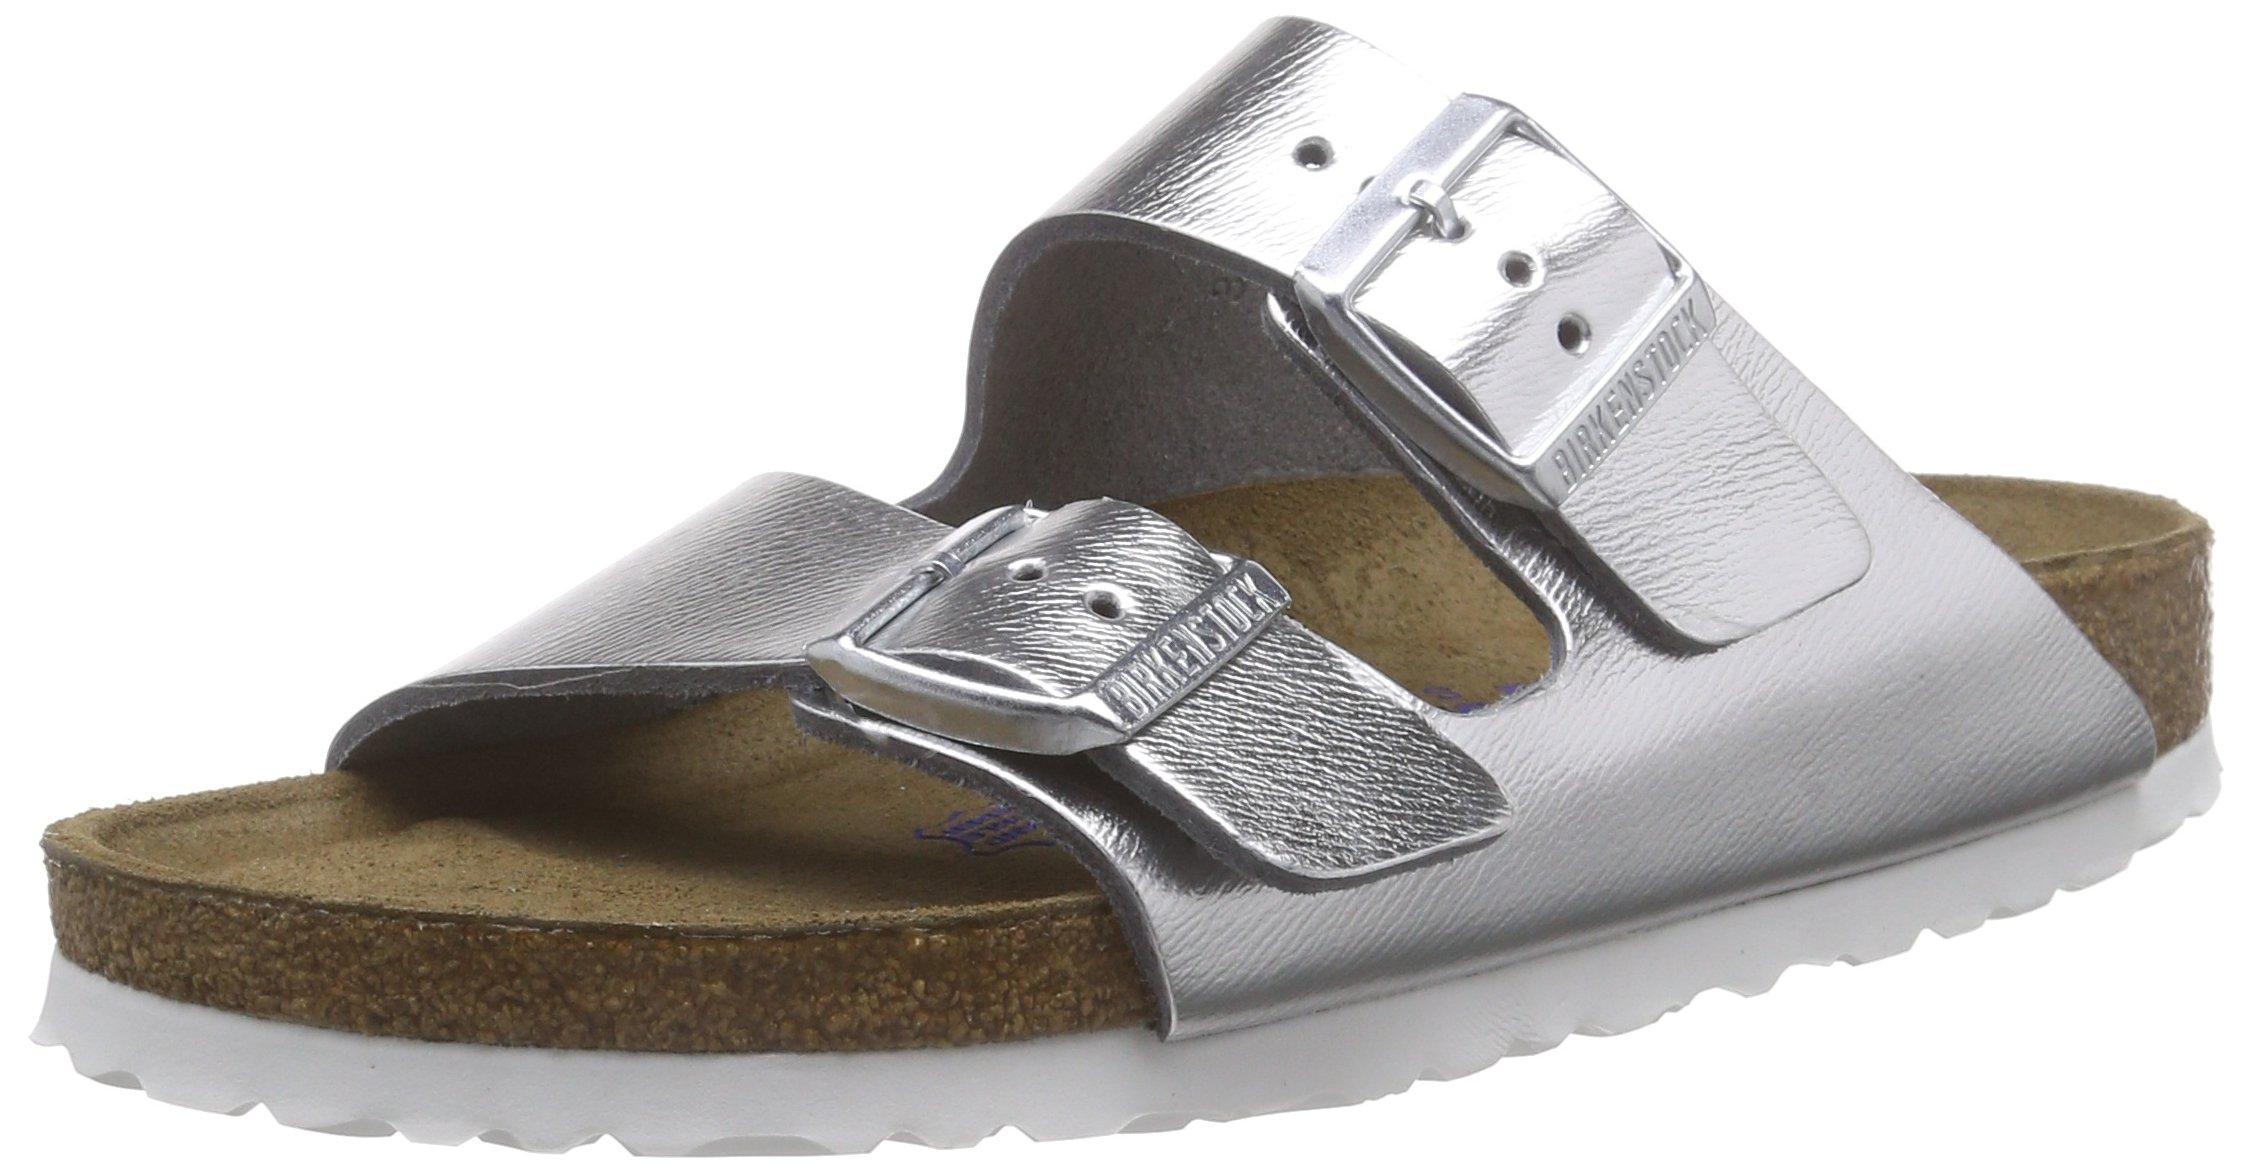 Birkenstock Arizona Narrow Fit - Liquid Silver Leather 1000062 Womens Sandals 37 EU